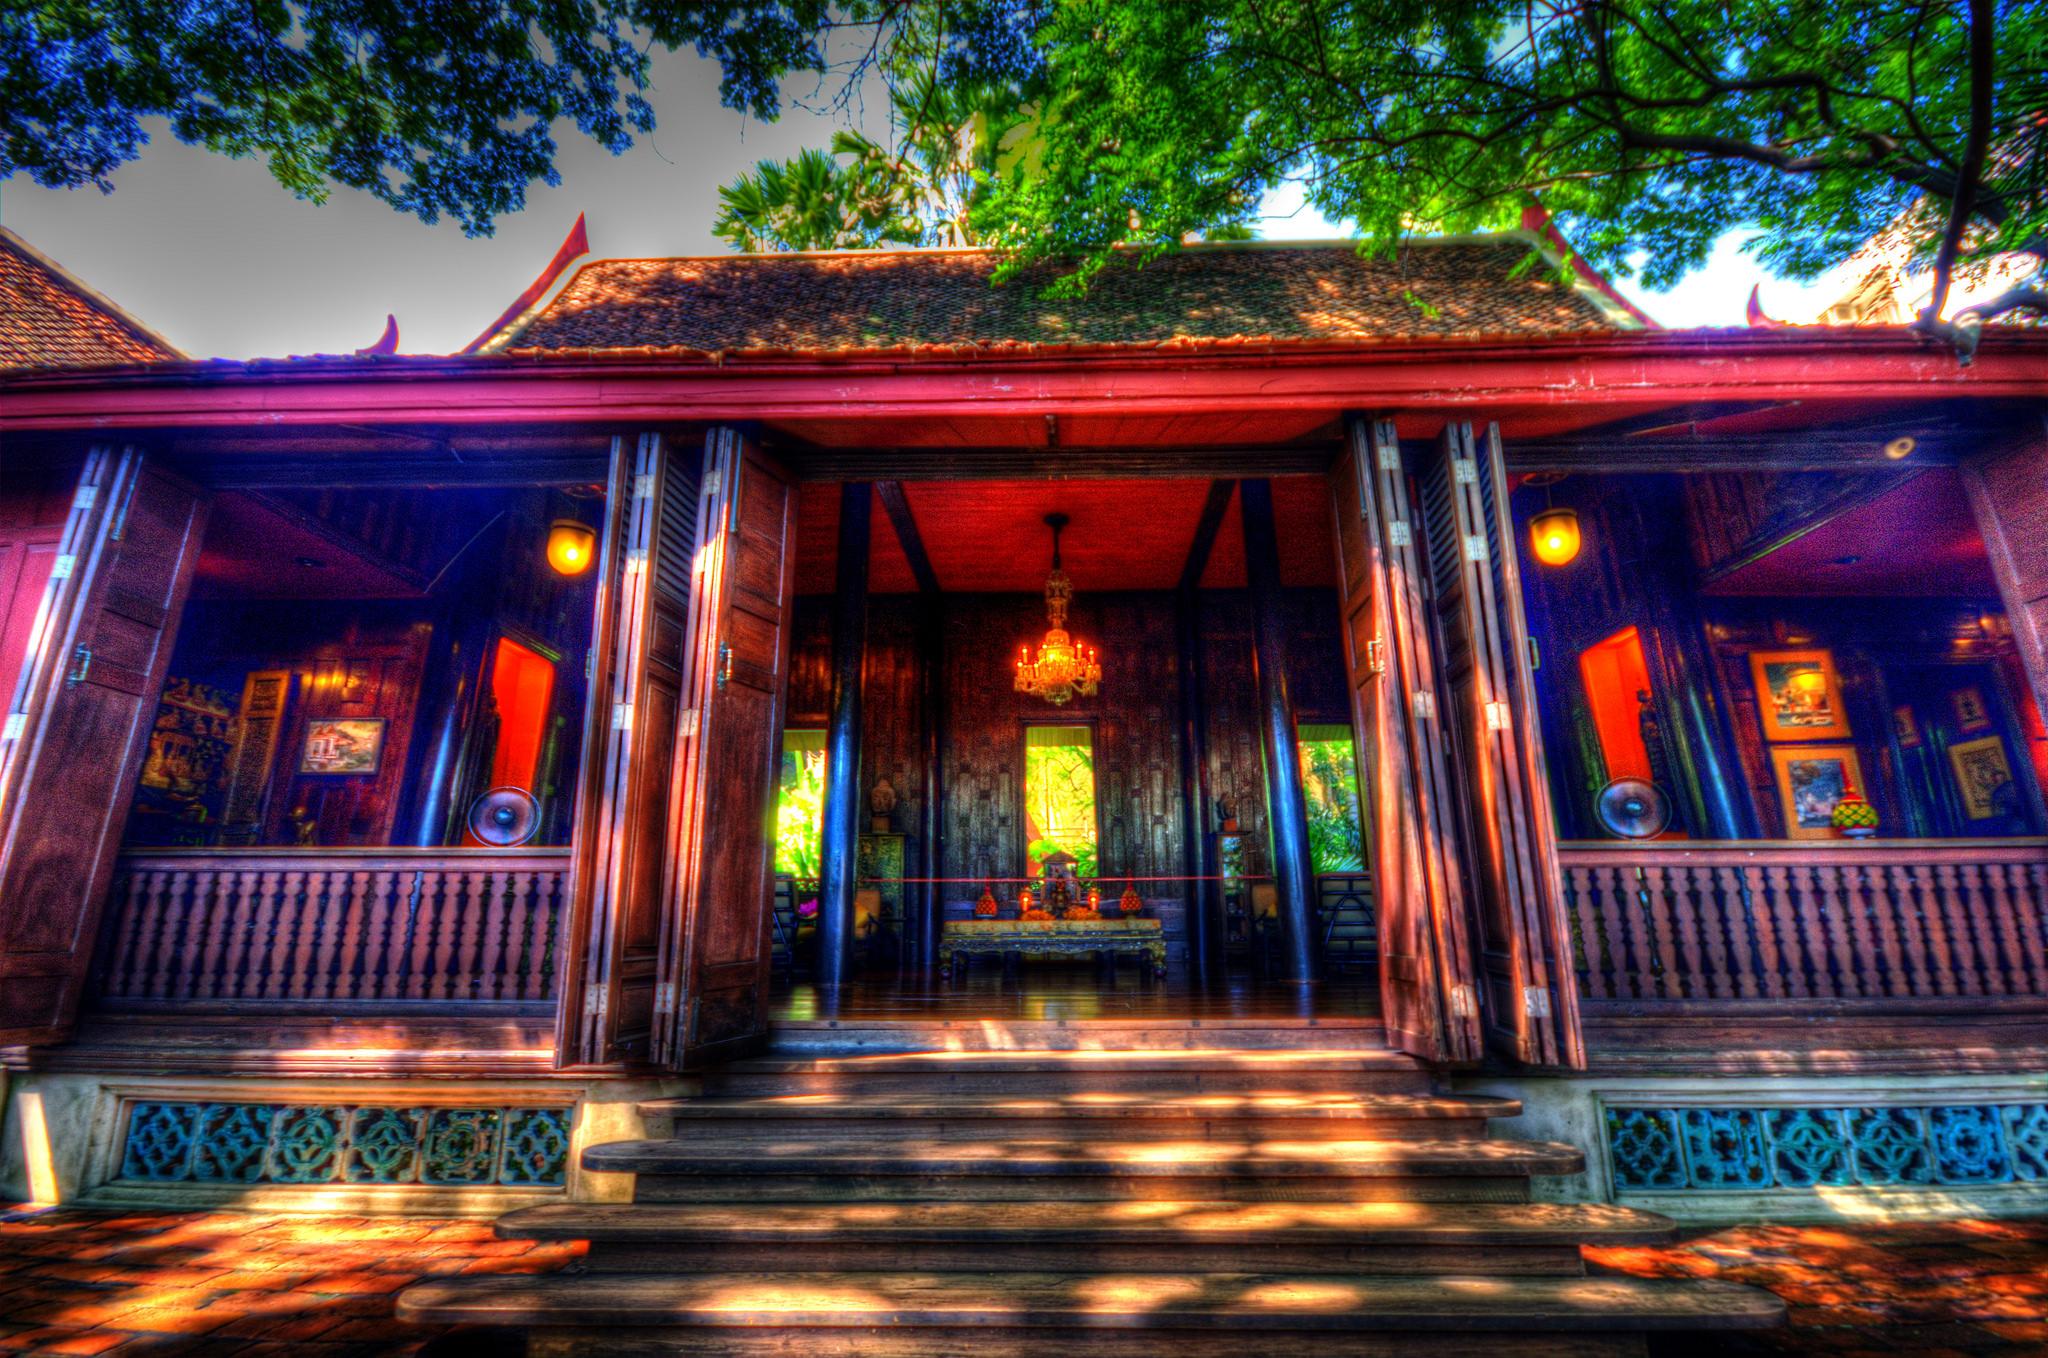 Jim Thompson House Thai House Museum - James H W Thompson Foundation